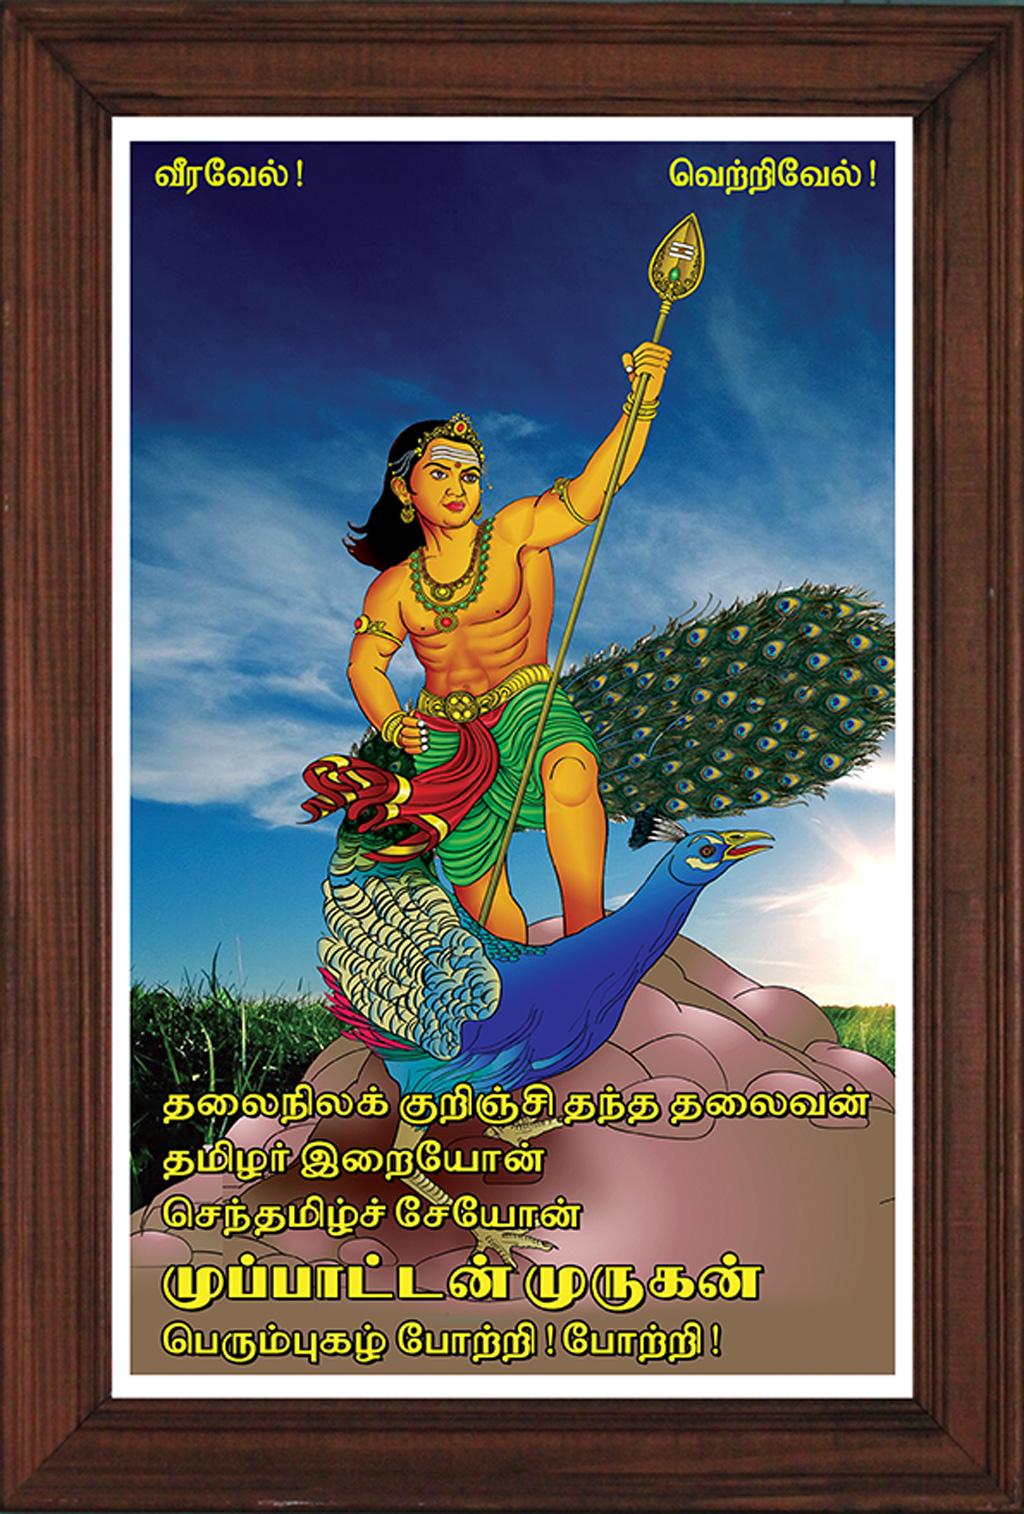 thirumuruga-peruvizha-veera-tamilar-munnani-4  திருமுருகப் பெருவிழா பதாகைகள் – தரவிறக்கம் செய்து பயன்படுத்தவும் thirumuruga peruvizha veera tamilar munnani 4